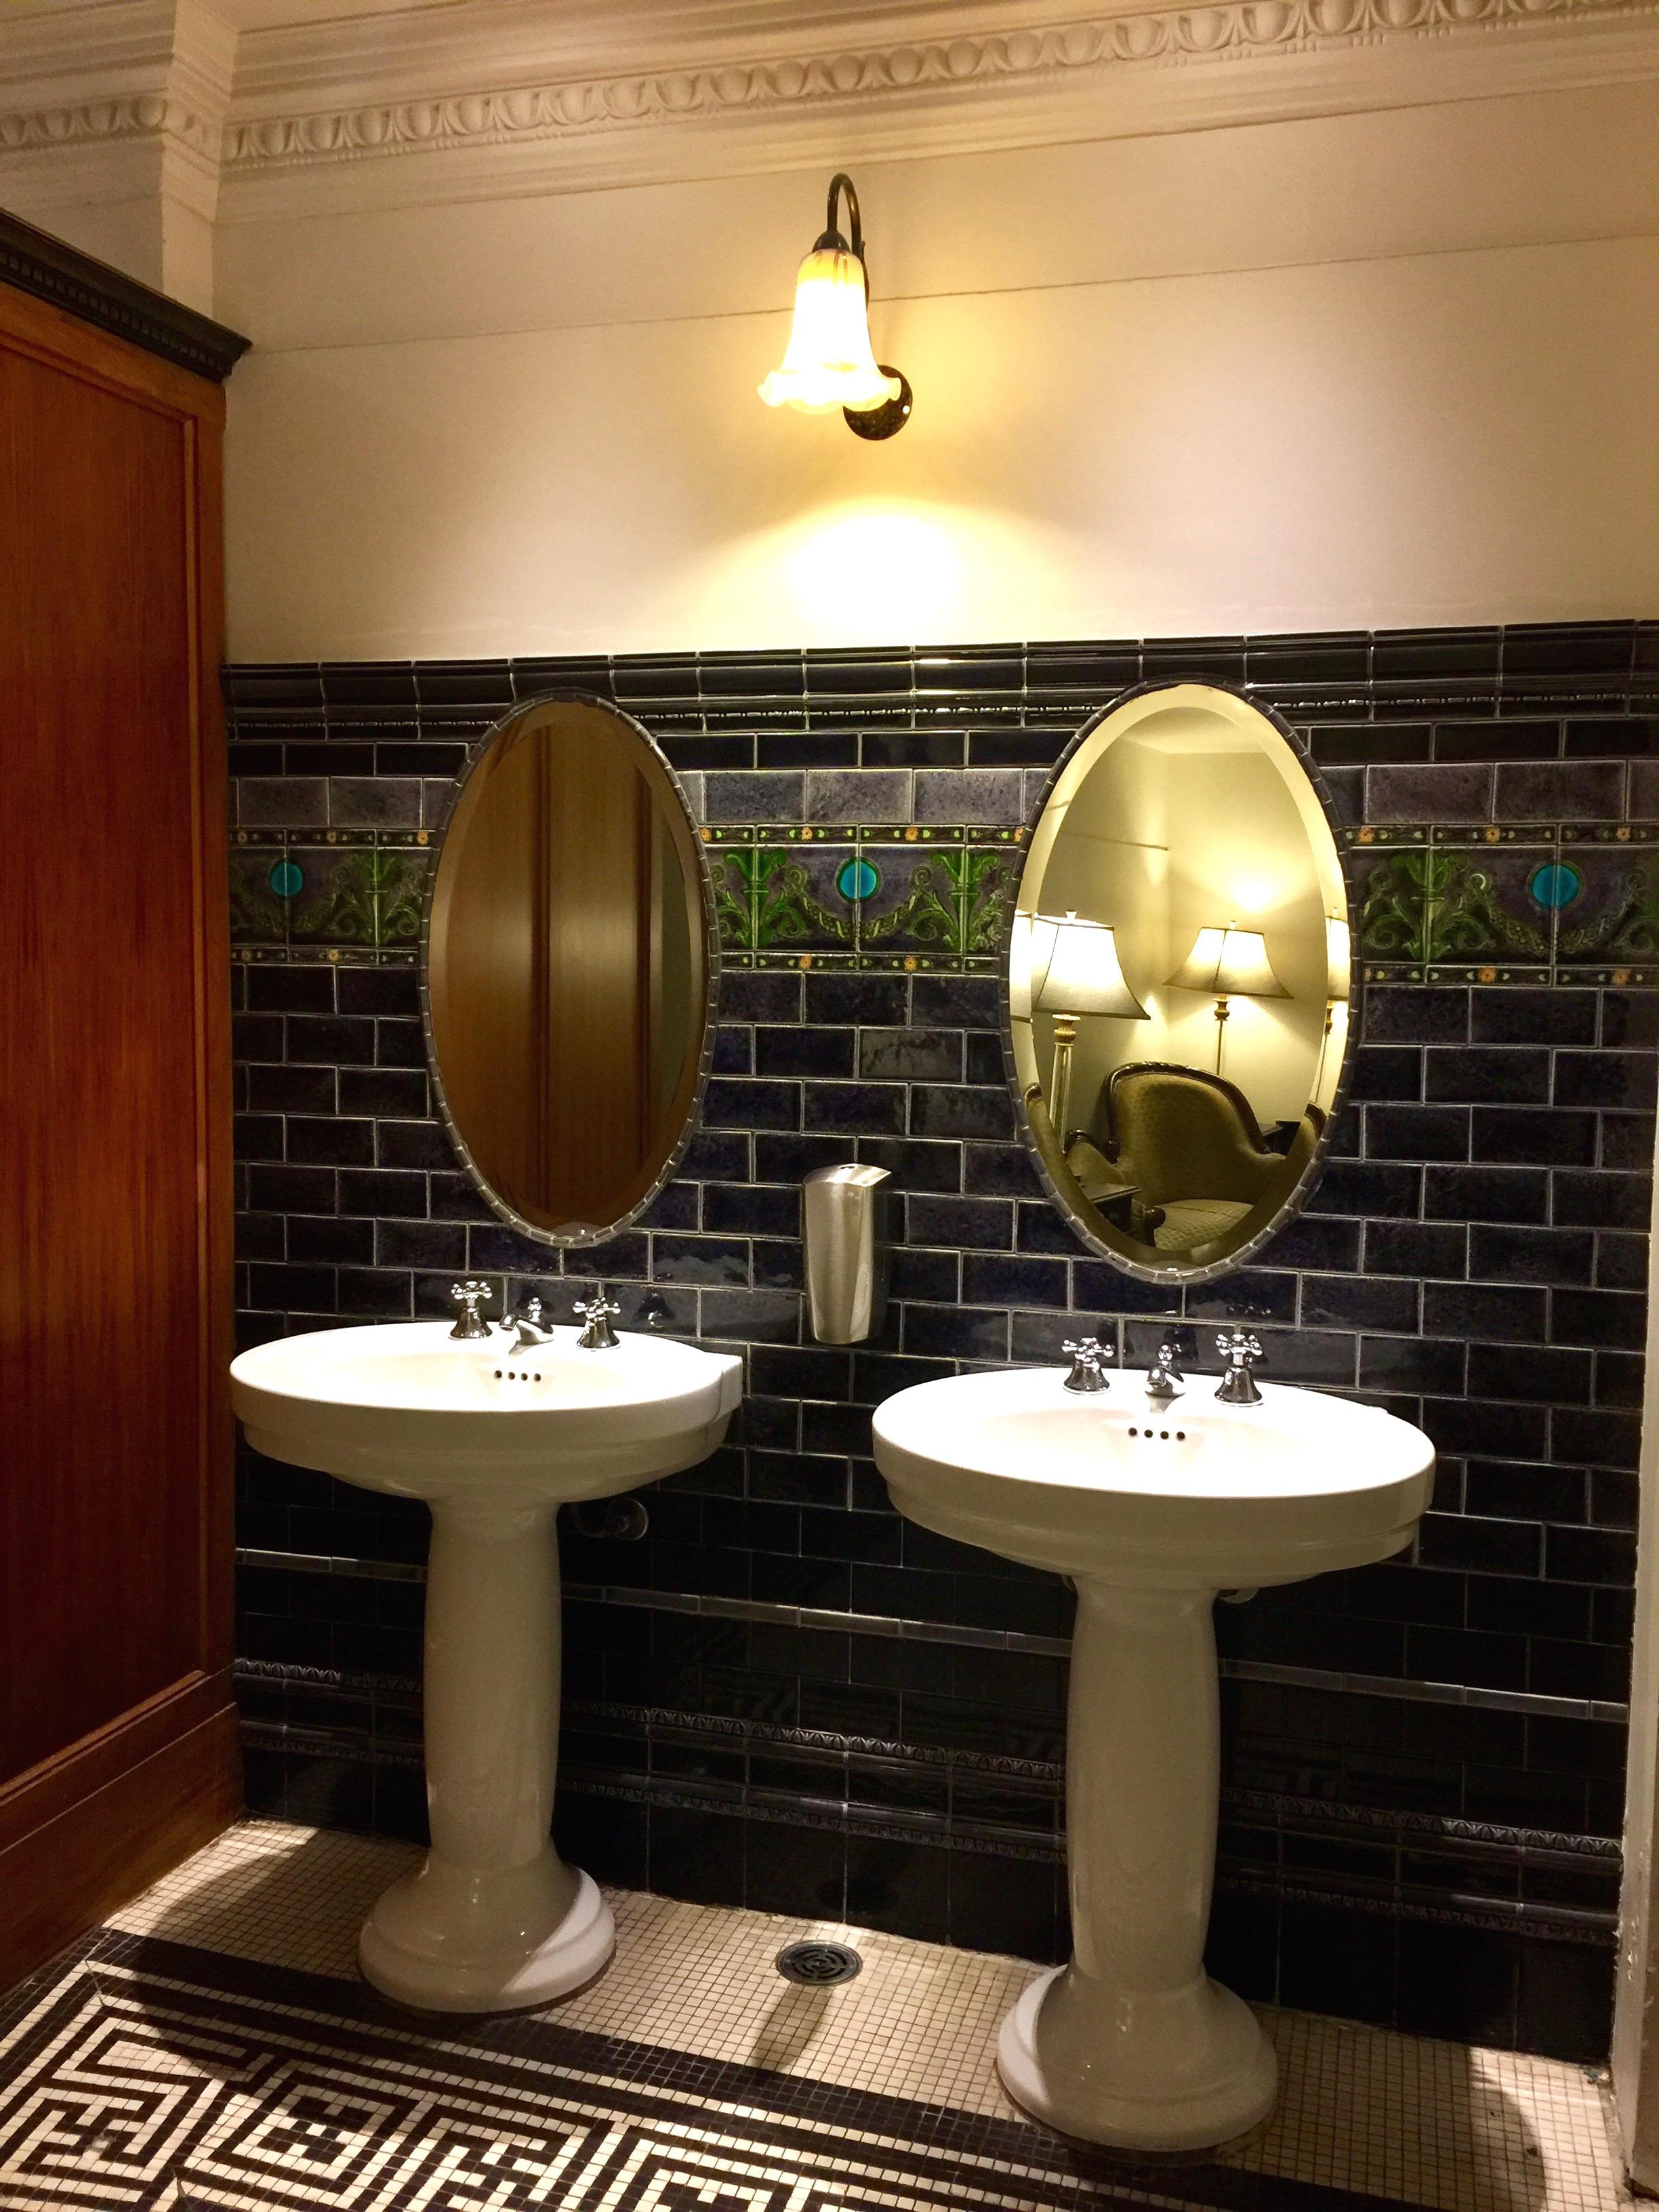 Art Deco toilets in Wellington's Embassy Cinema